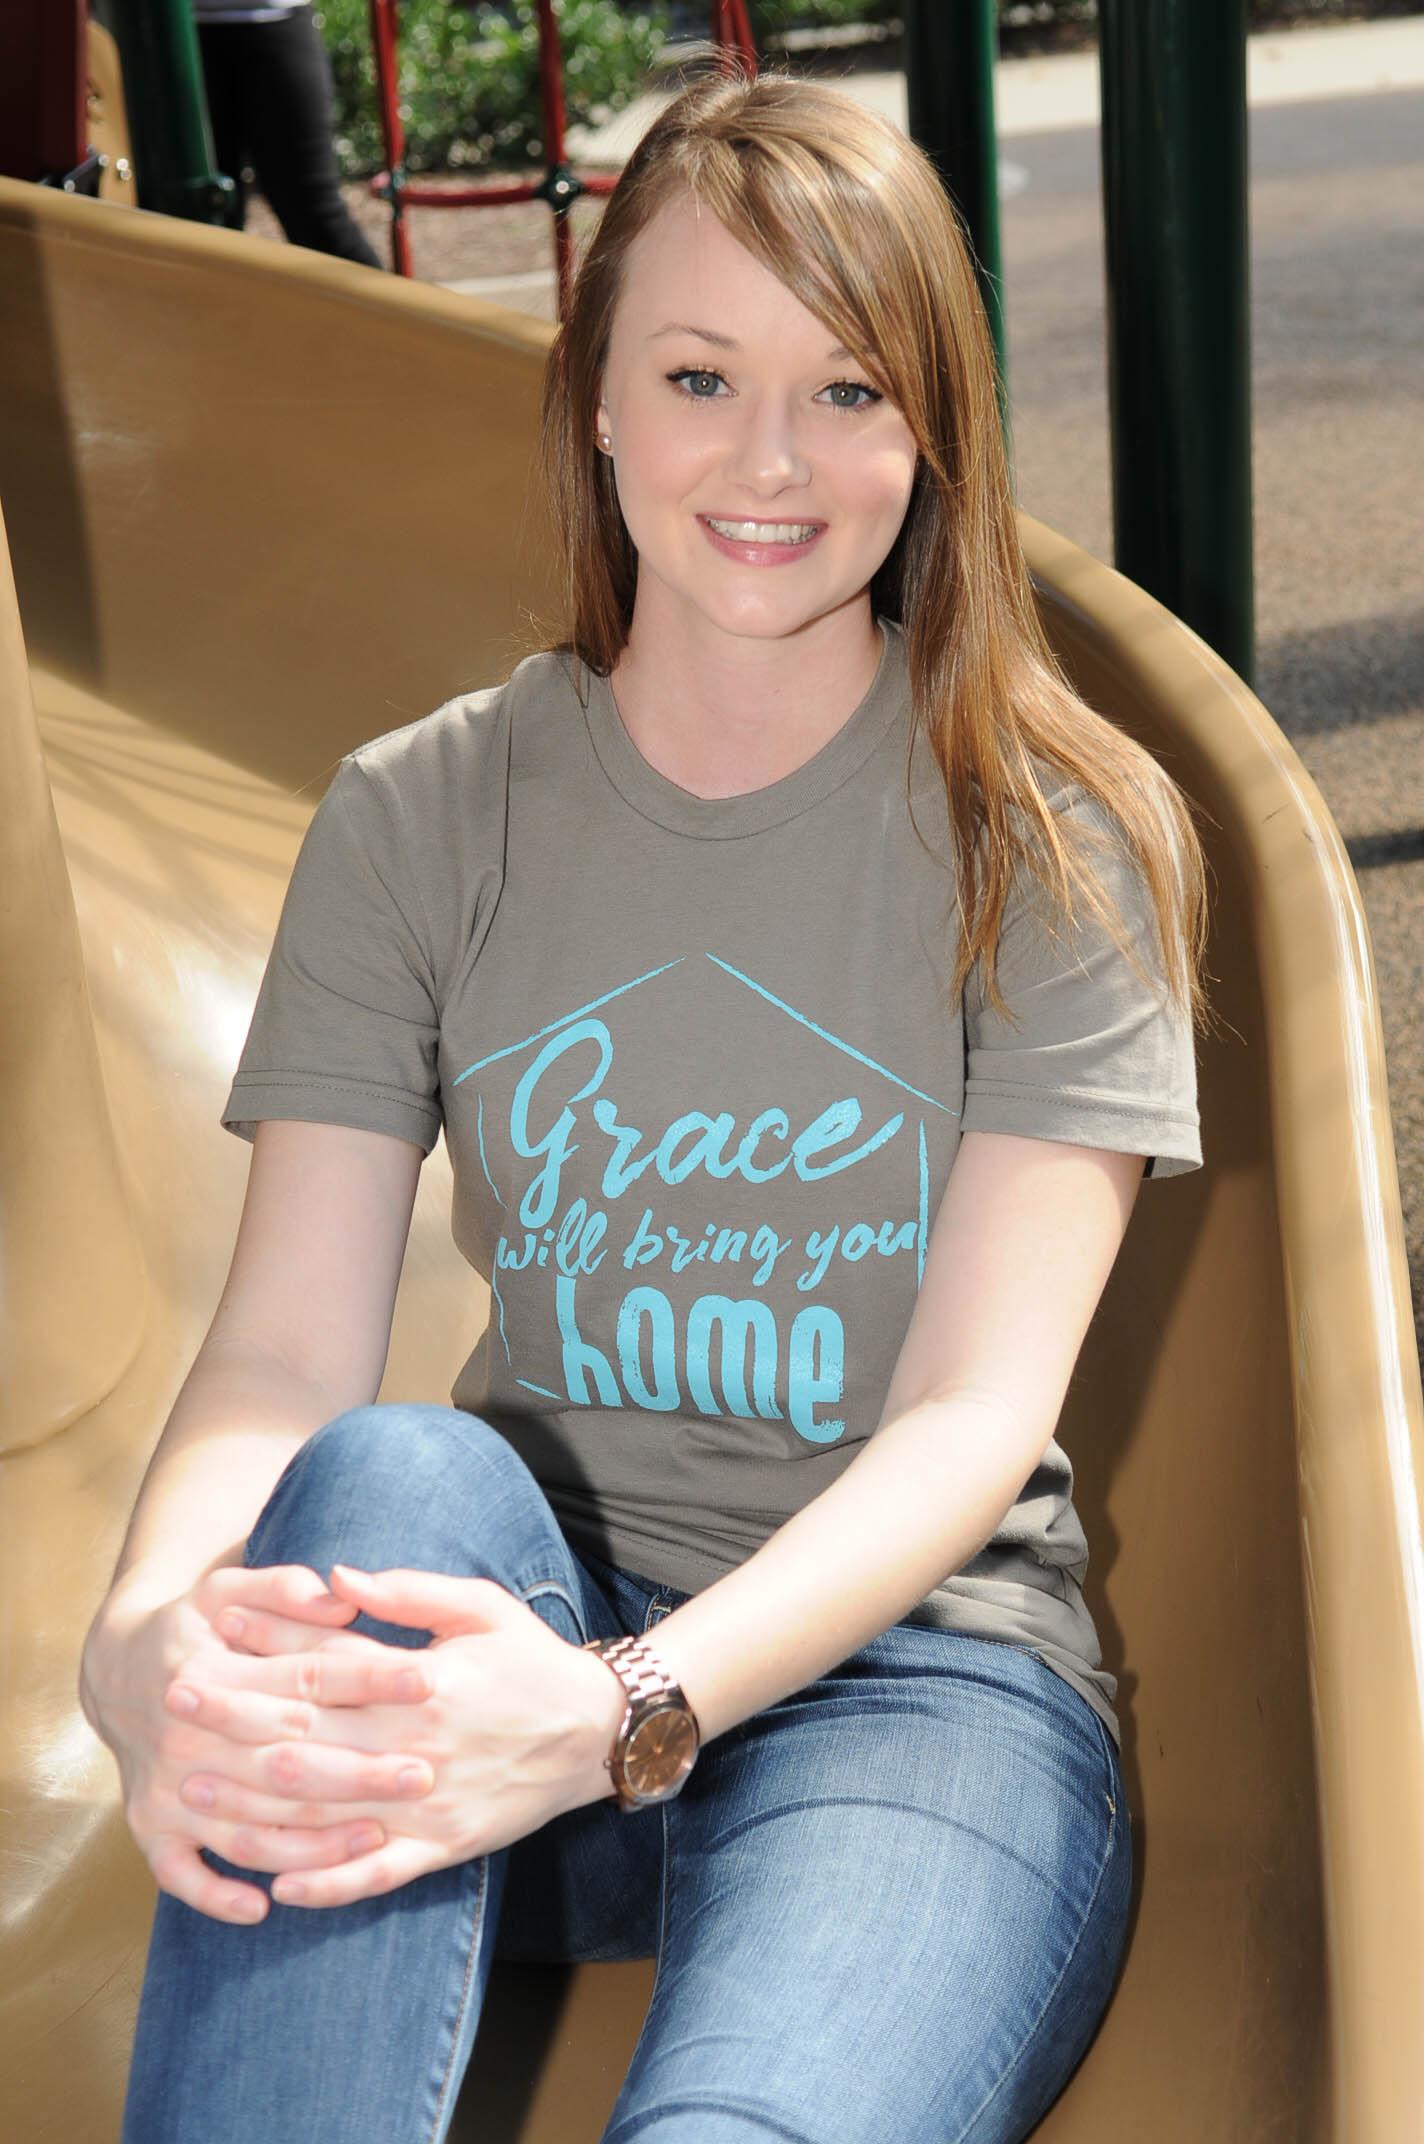 Grace-Bring-You-Home-Slide-tshirt